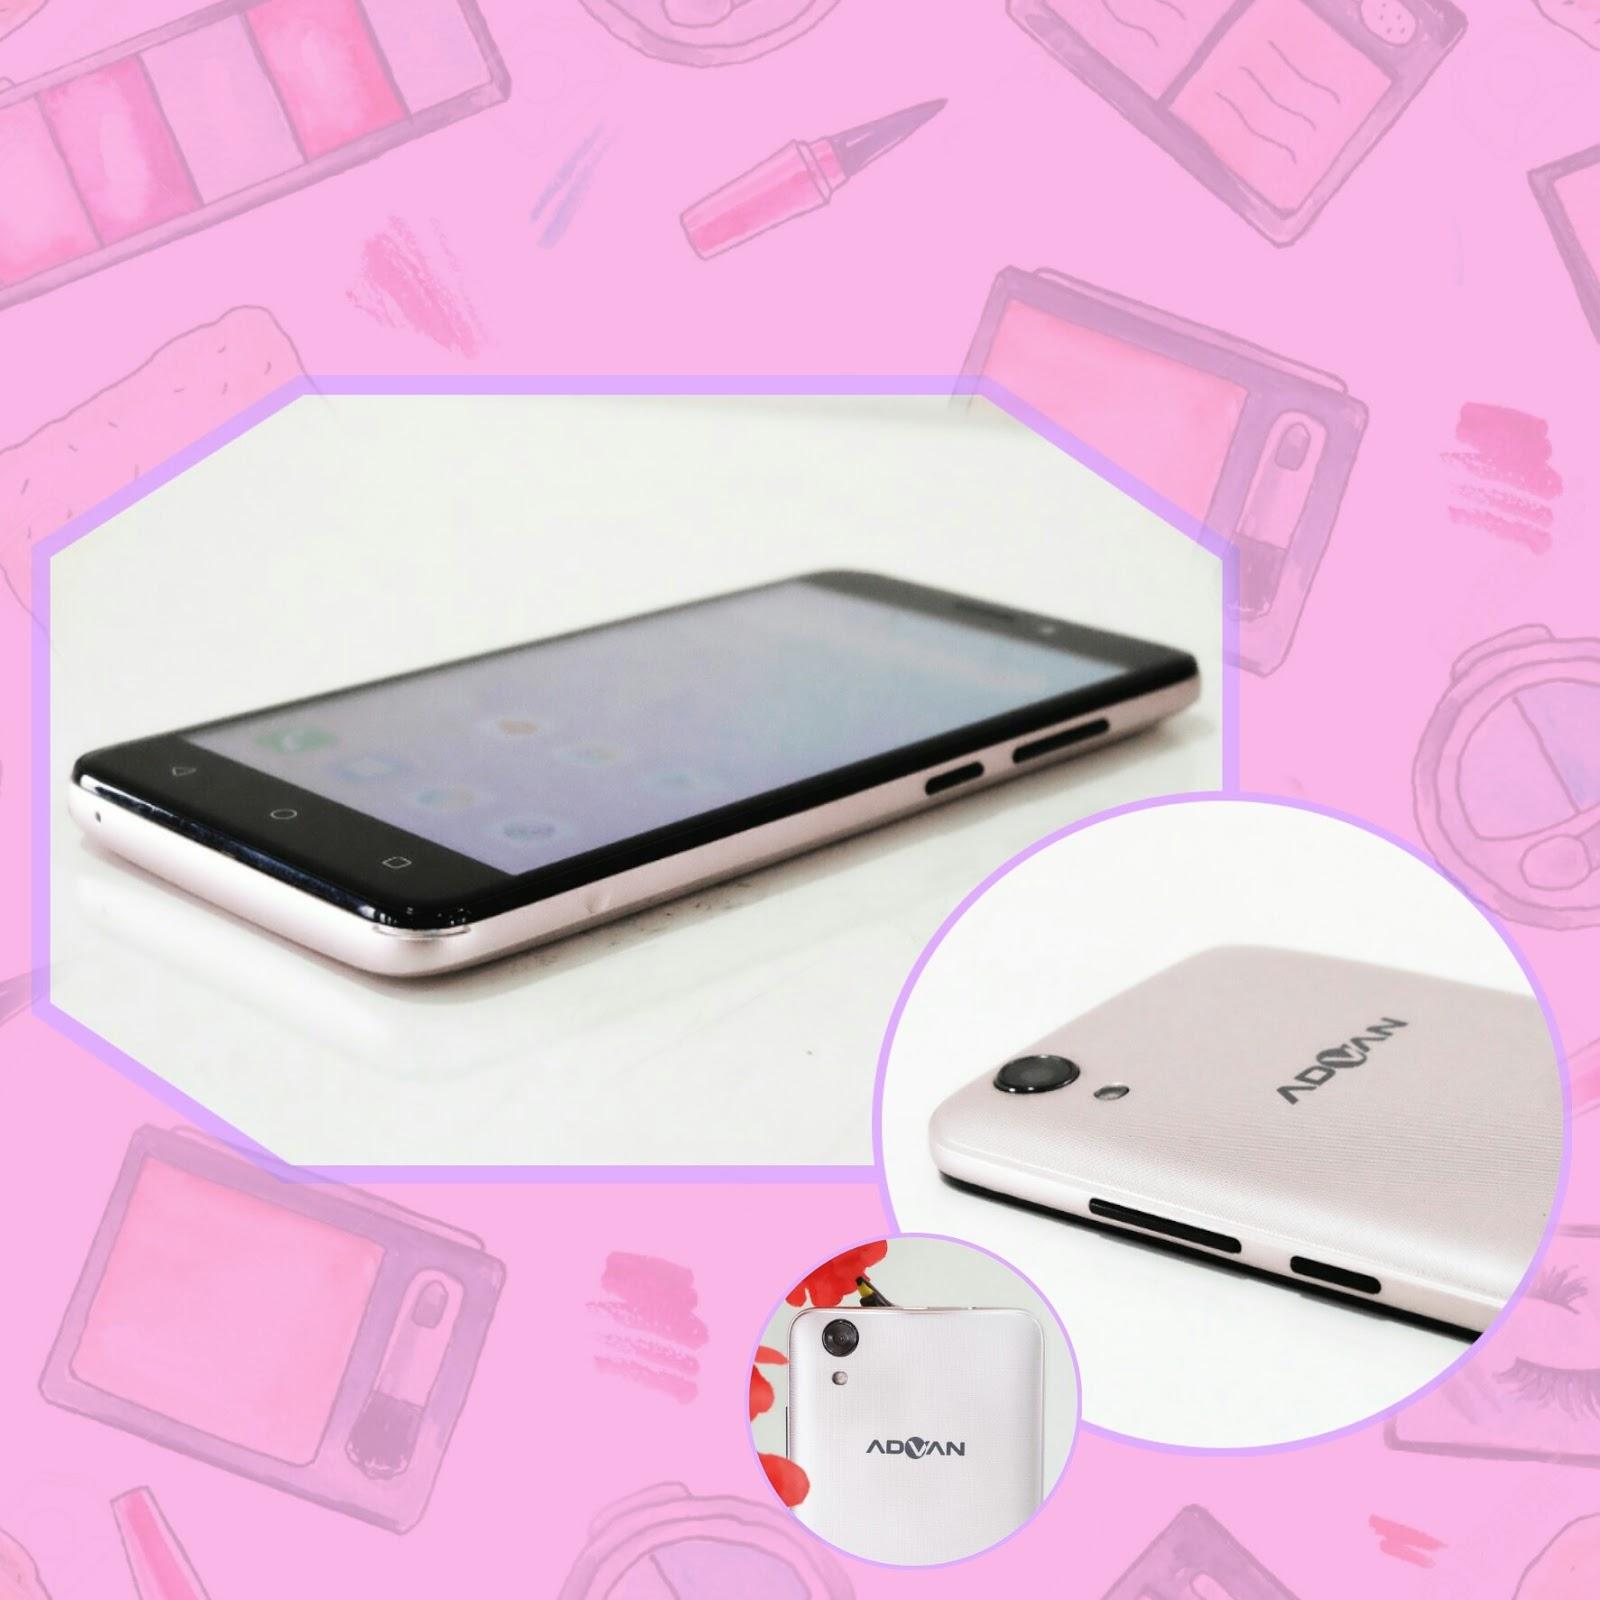 Uni Dzalika: Keunggulan Produk Lokal ADVAN S50 4G UNLIMITED